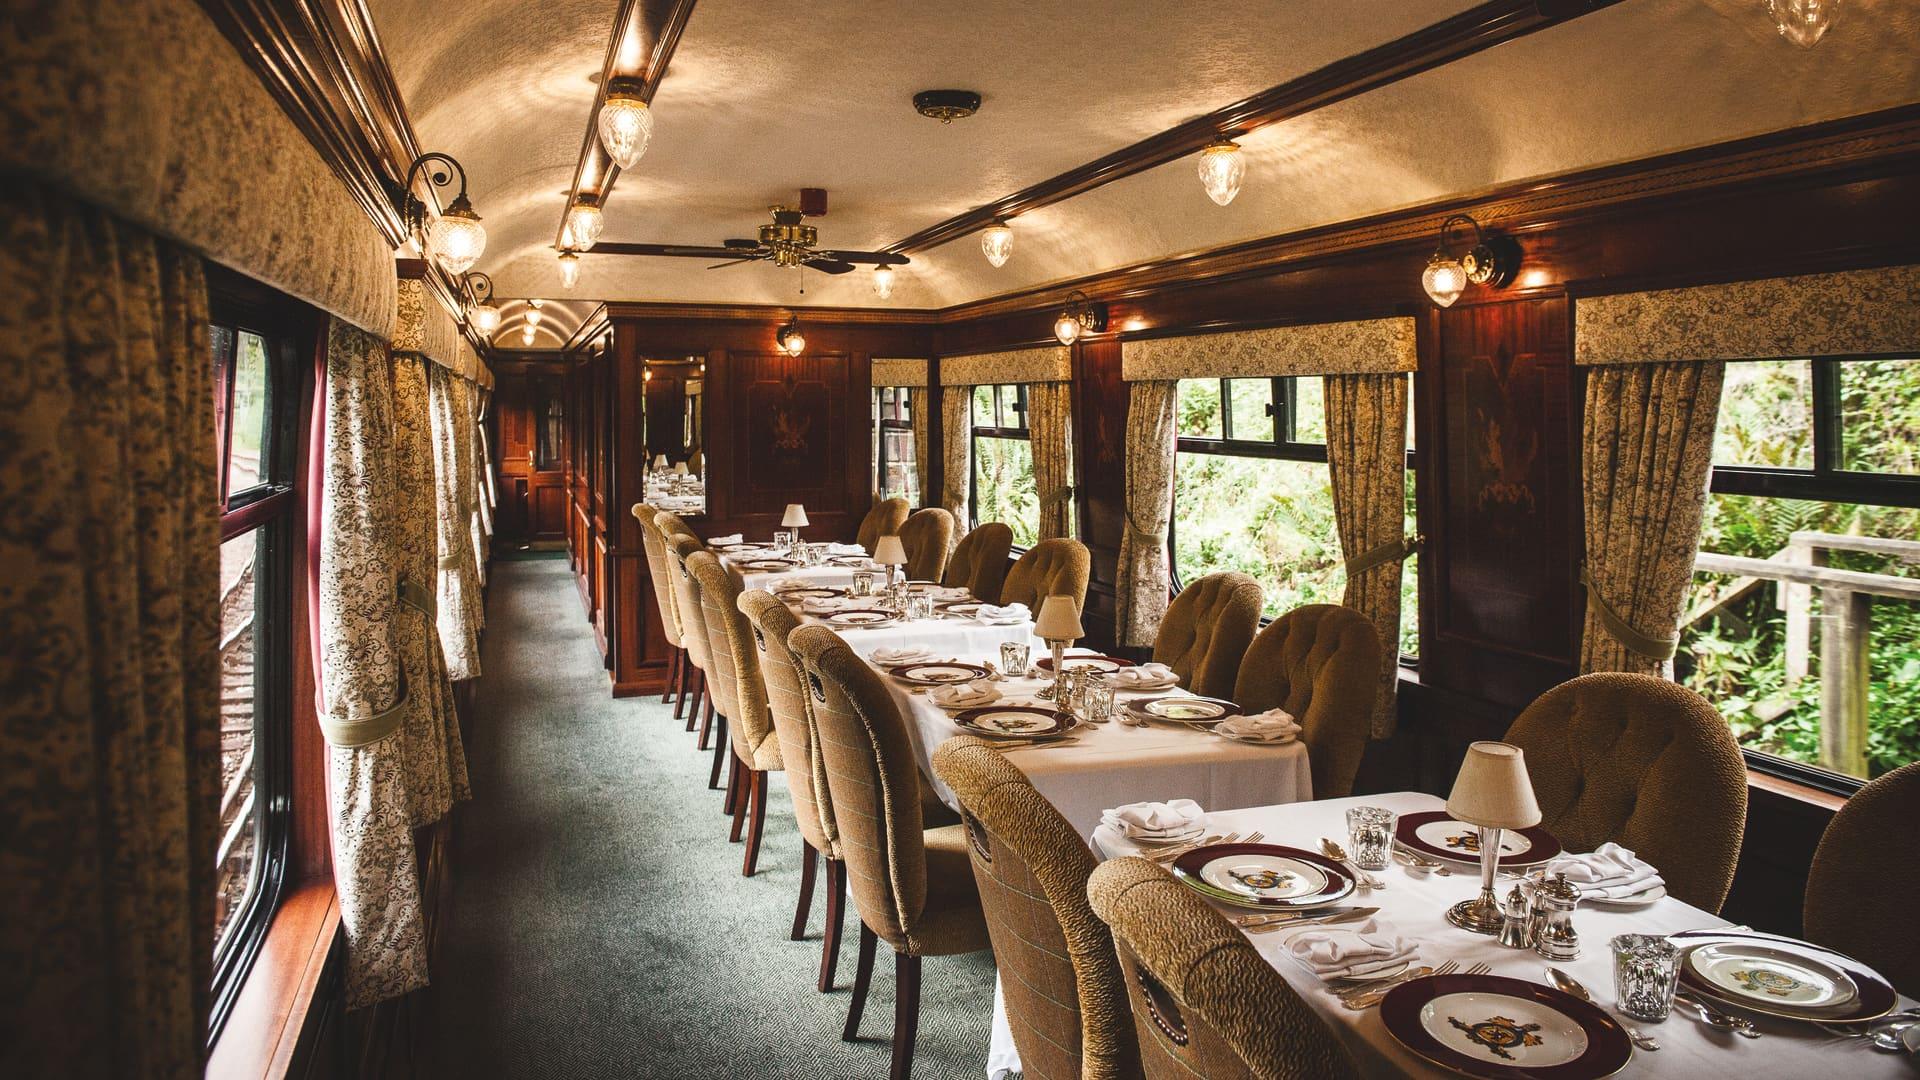 The mahogany-paneled dining cars on the Belmond Royal Scotsman.